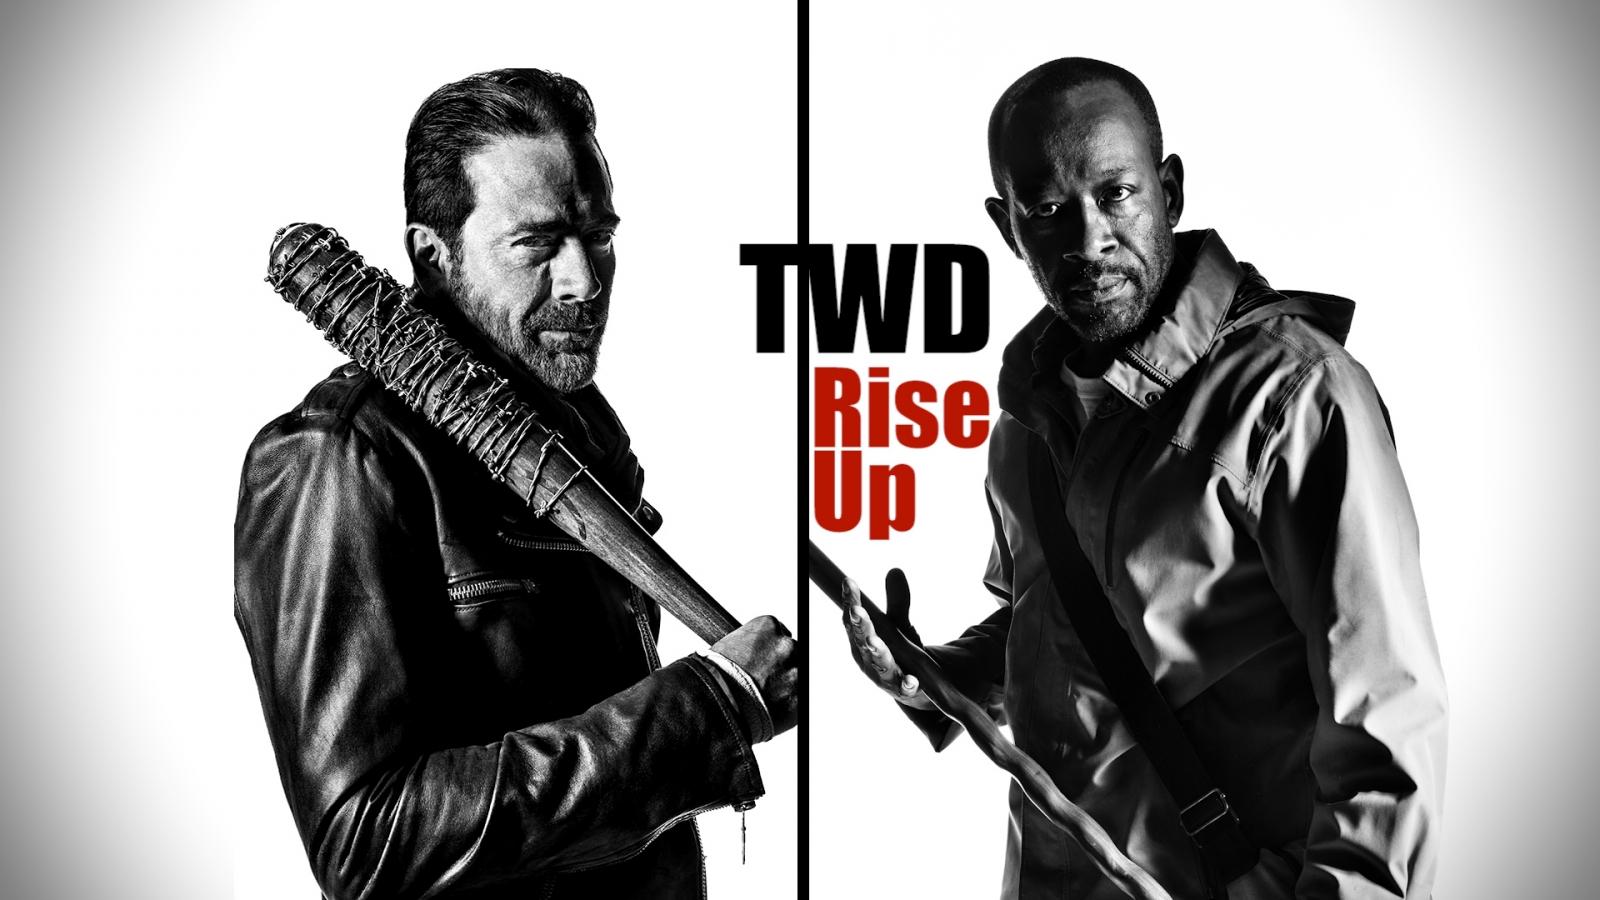 The Walking Dead Villain Negan Will Challenge Morgan In Season 7 Teases Lennie James